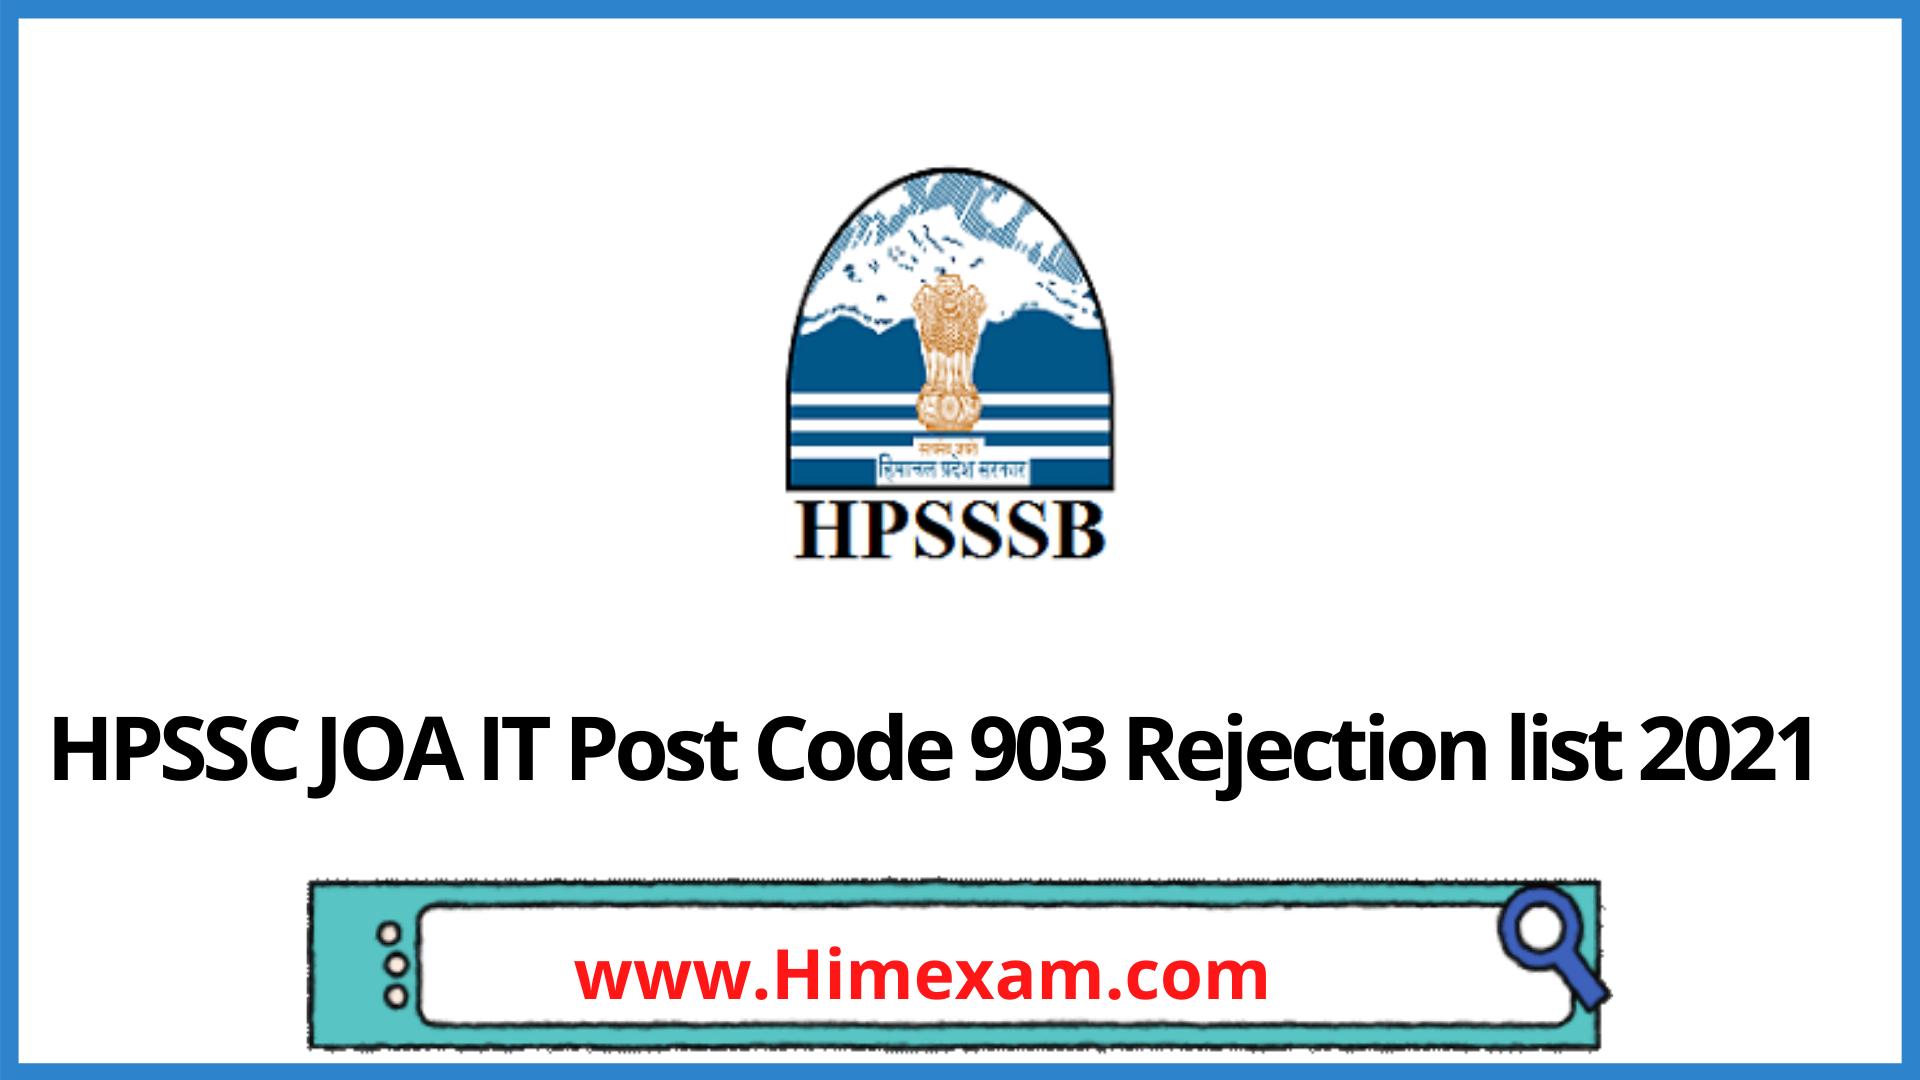 HPSSC JOA IT Post Code 903 Rejection list 2021